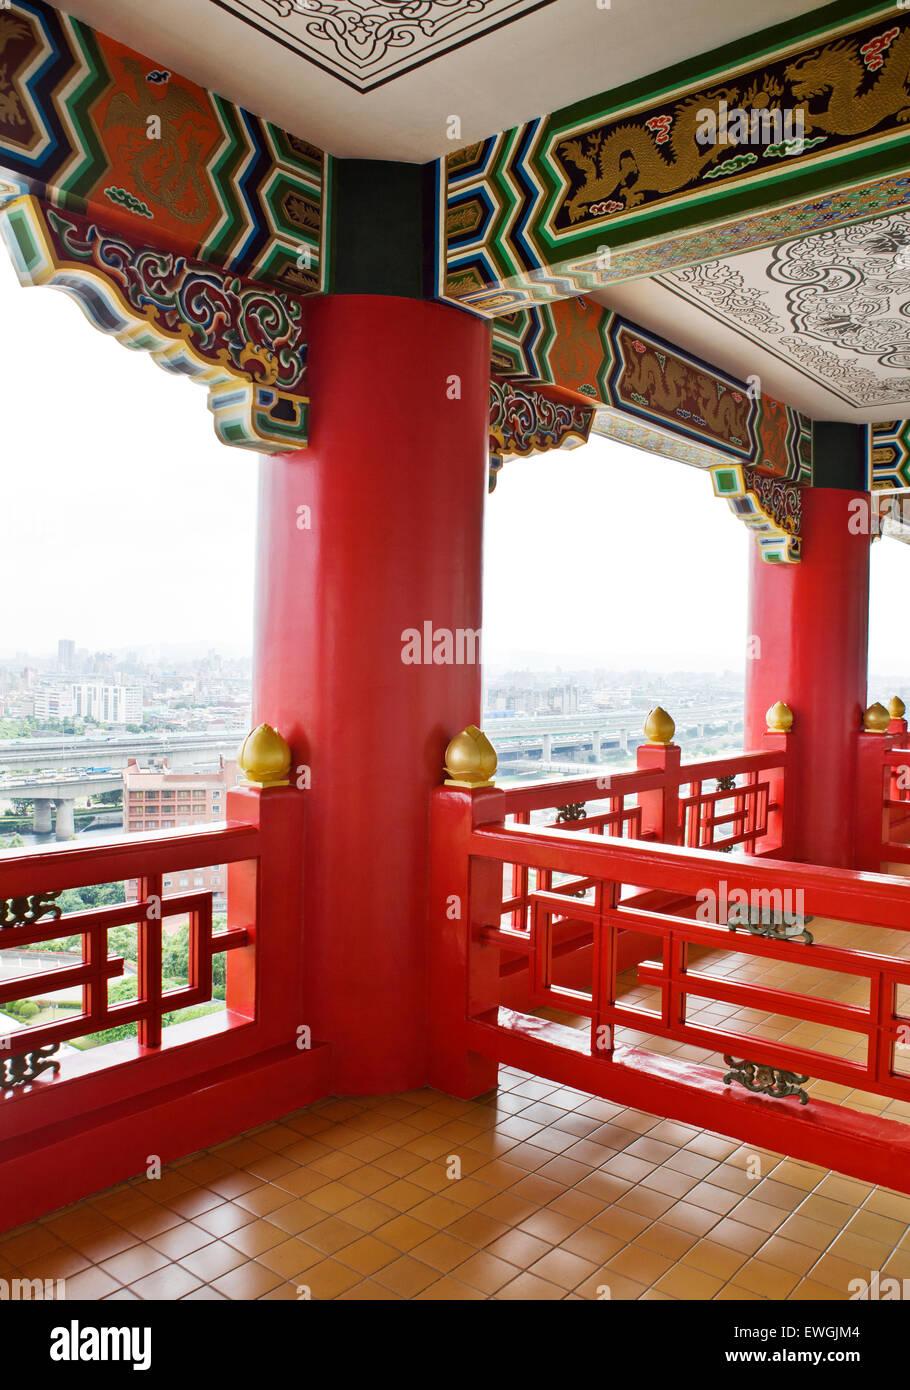 The Grand Hotel, Taipei, Taiwan. - Stock Image